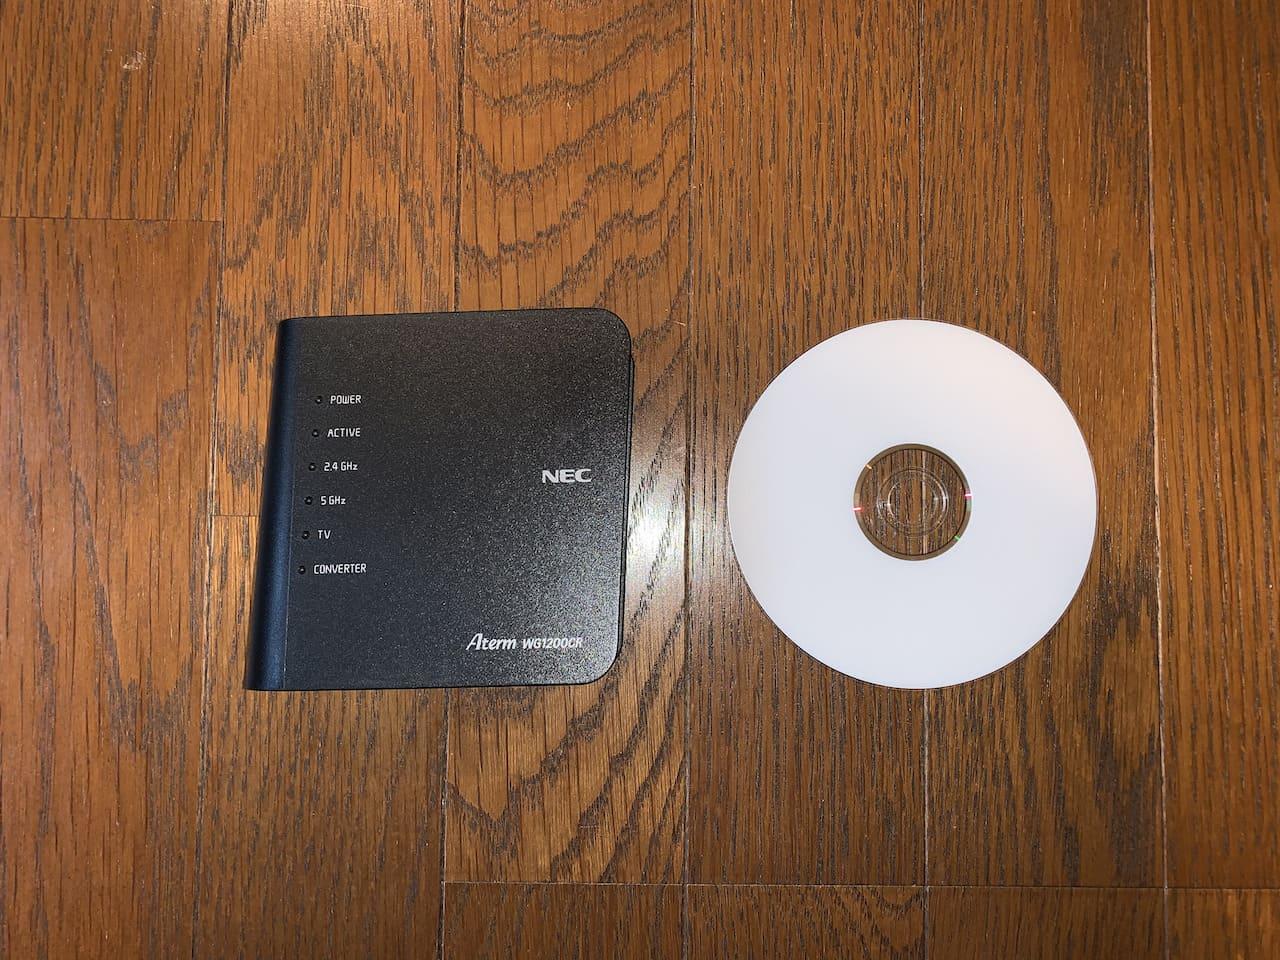 Aterm WG1200CR(PA-WG1200CR)のサイズ比較